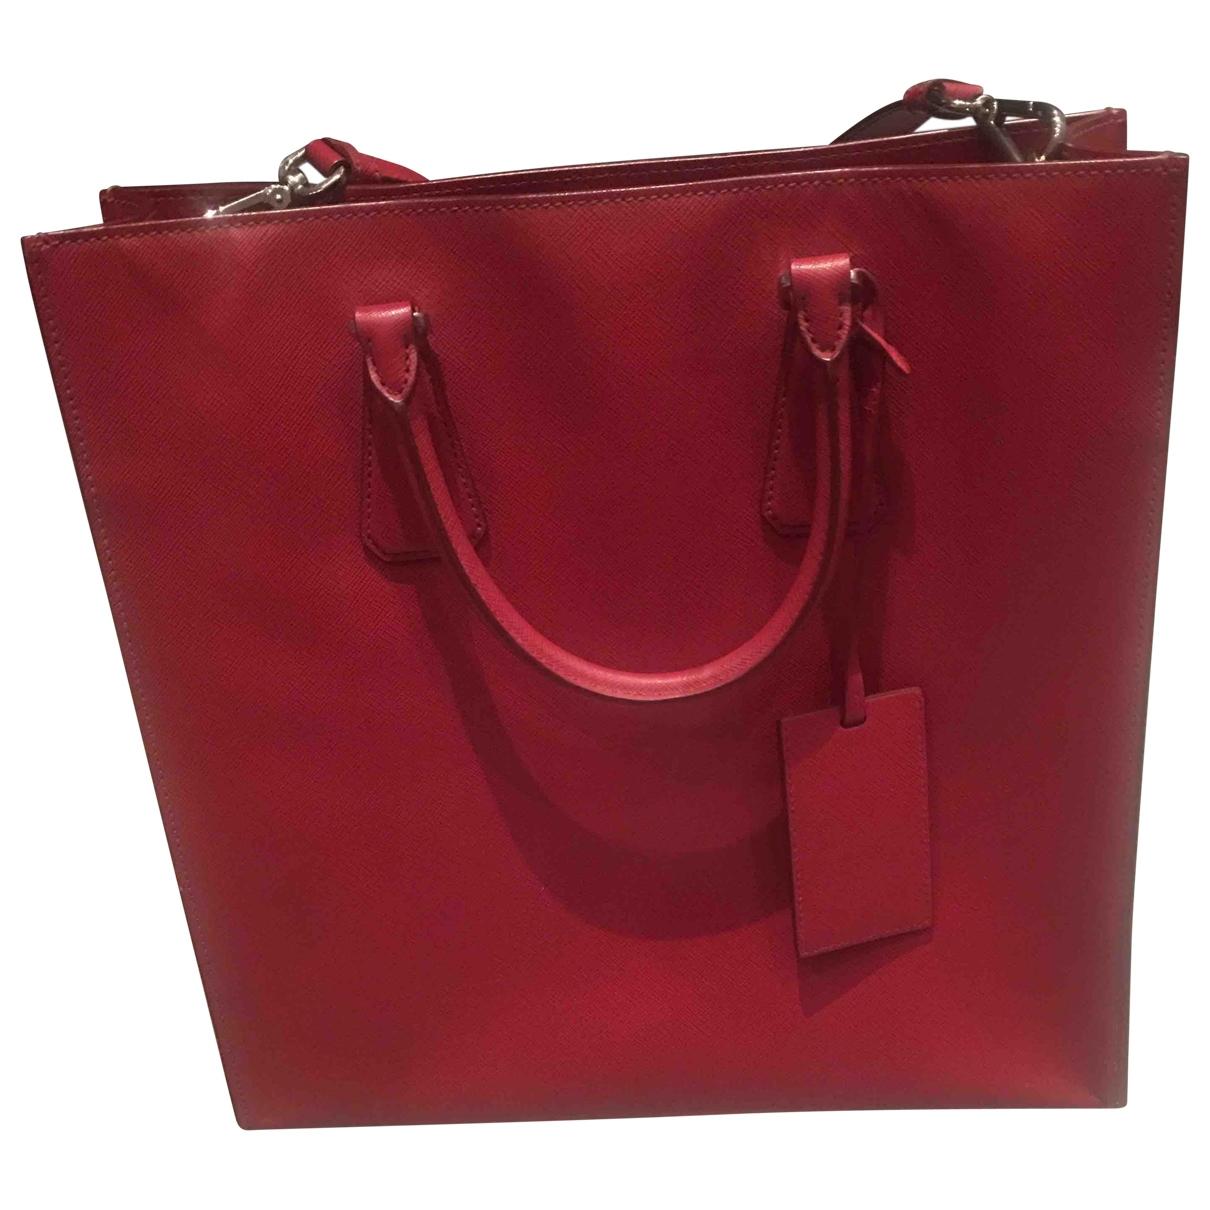 Prada \N Handtasche in  Rot Leder